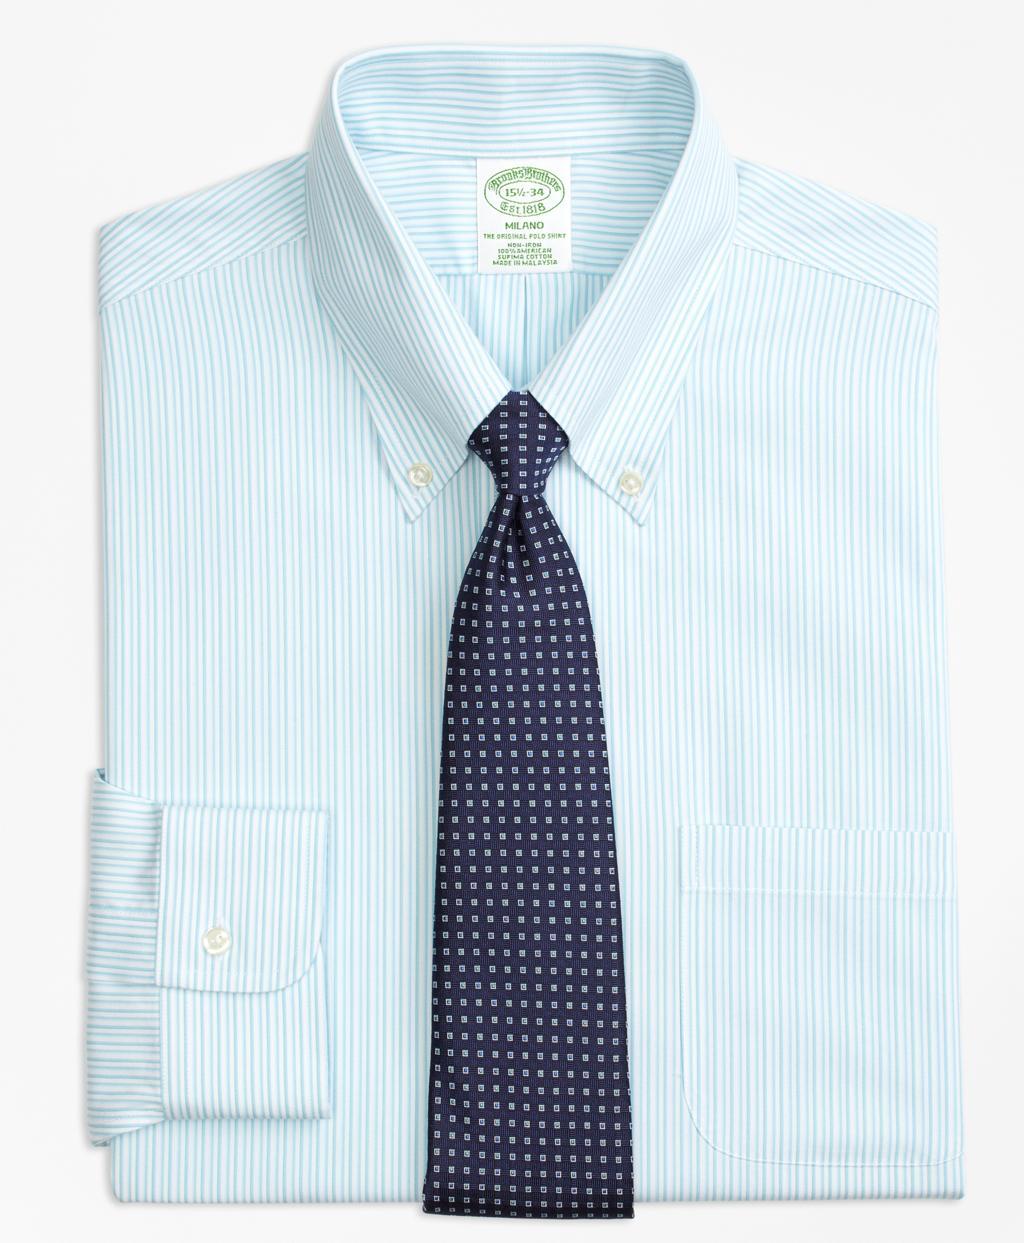 Lyst Brooks Brothers Milano Slim Fit Dress Shirt Non